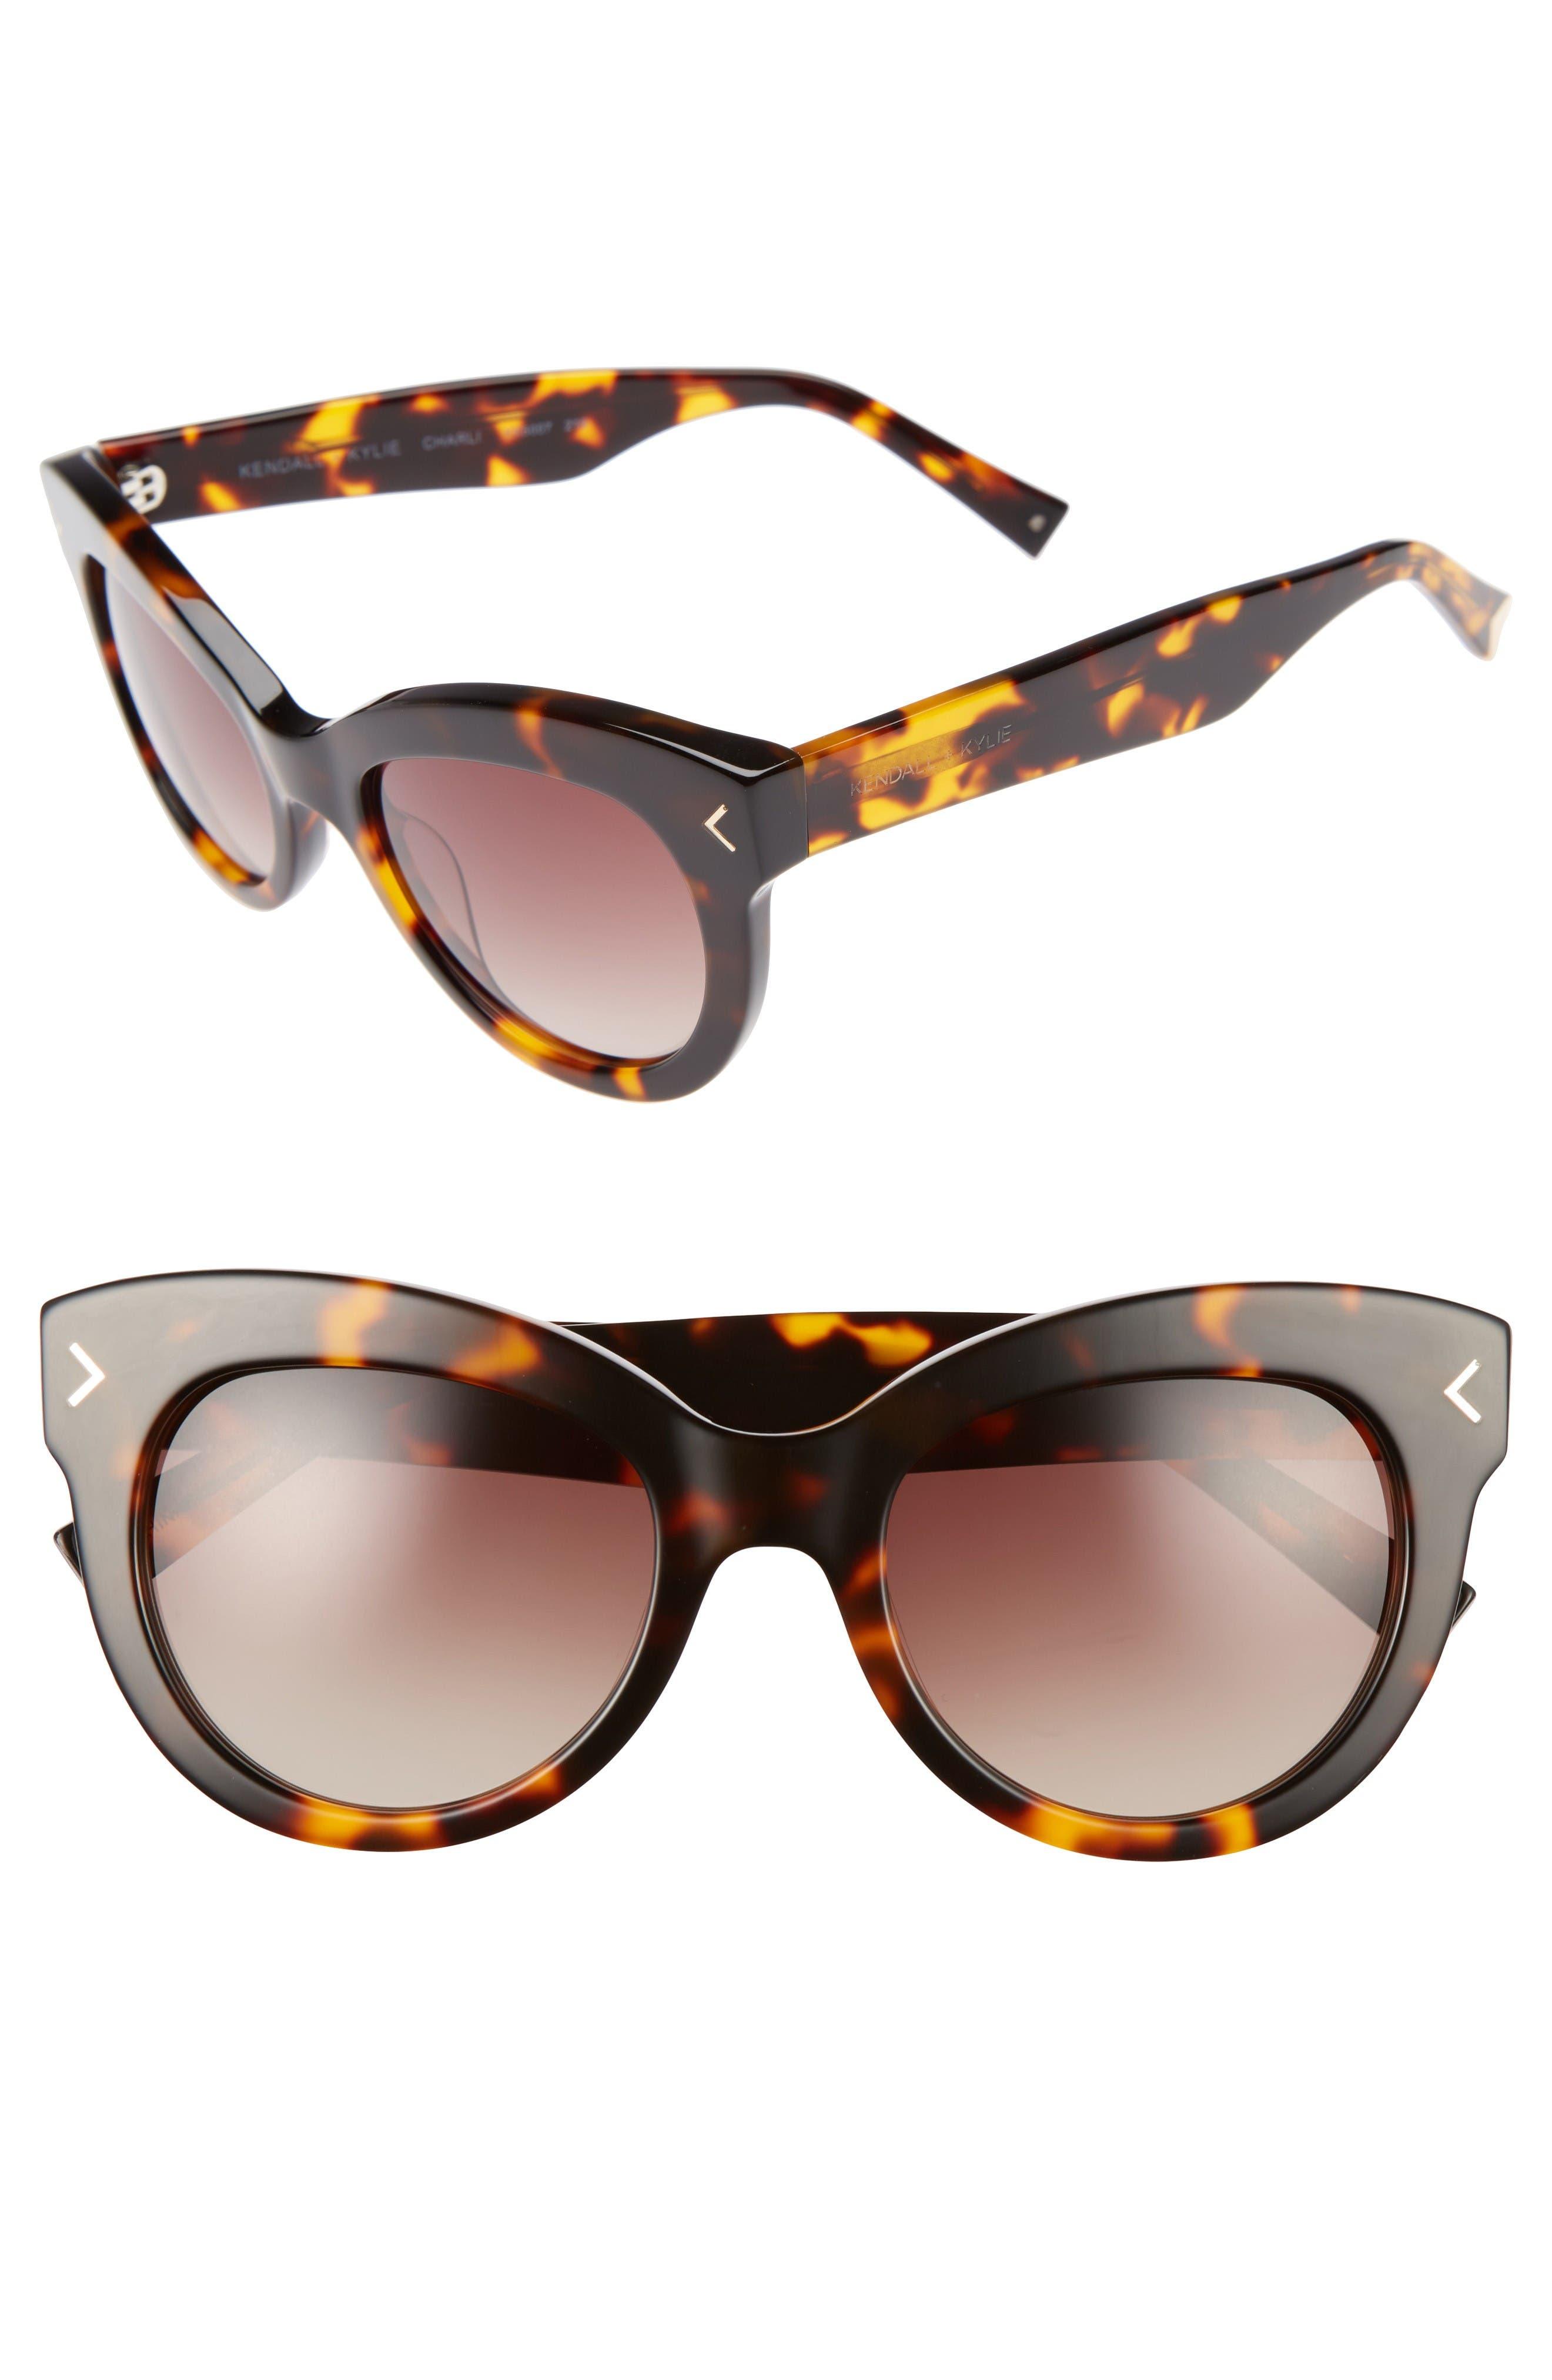 KENDALL + KYLIE Charli 52mm Cat Eye Sunglasses